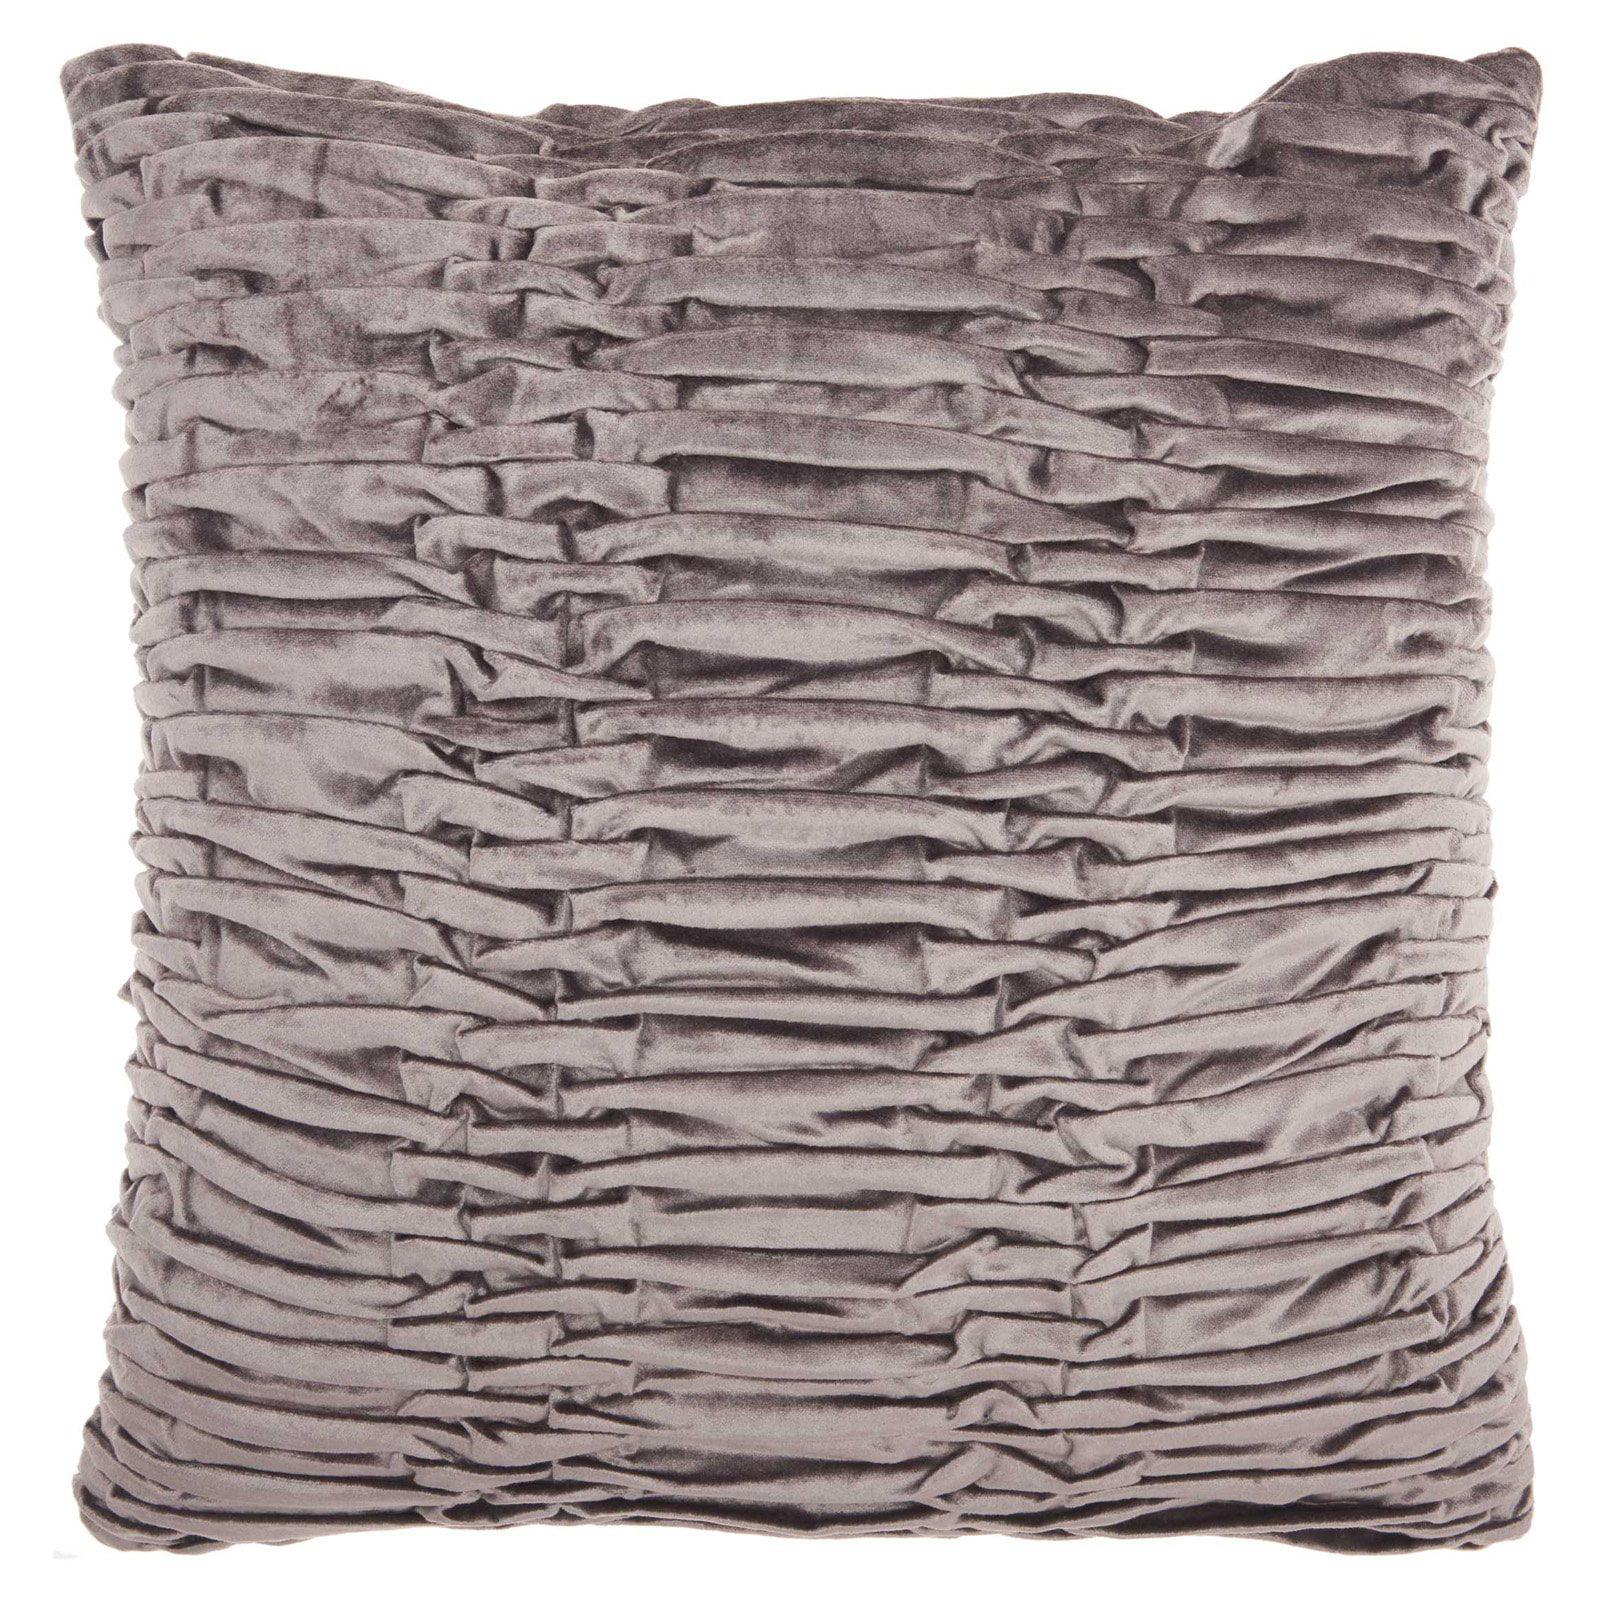 "Nourison Life Styles Ruched Velvet Decorative Throw Pillow, 18"" x 18"", Beige"